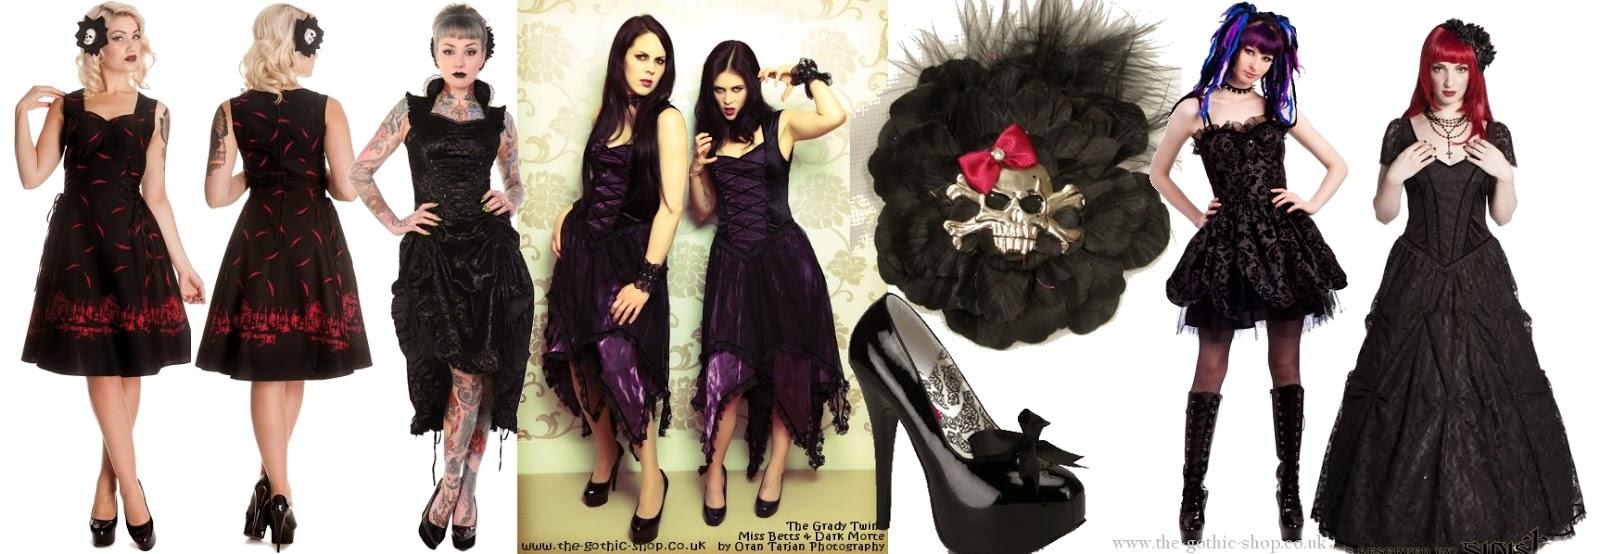 High Quality The Gothic Shop Blog